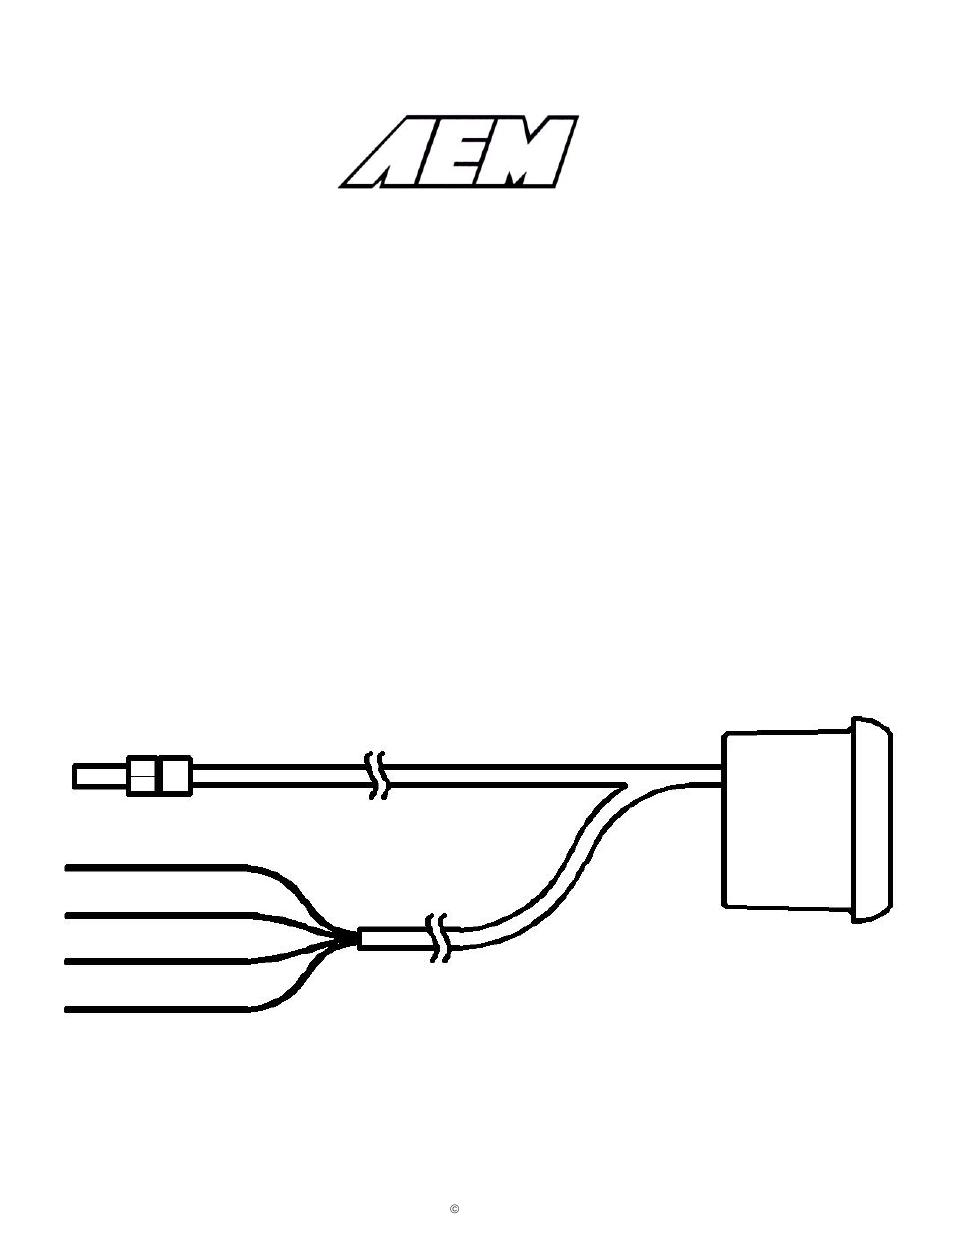 medium resolution of aem 30 4408 digital boost gauge user manual 2 pages also for 30 aem oil pressure sensor wiring